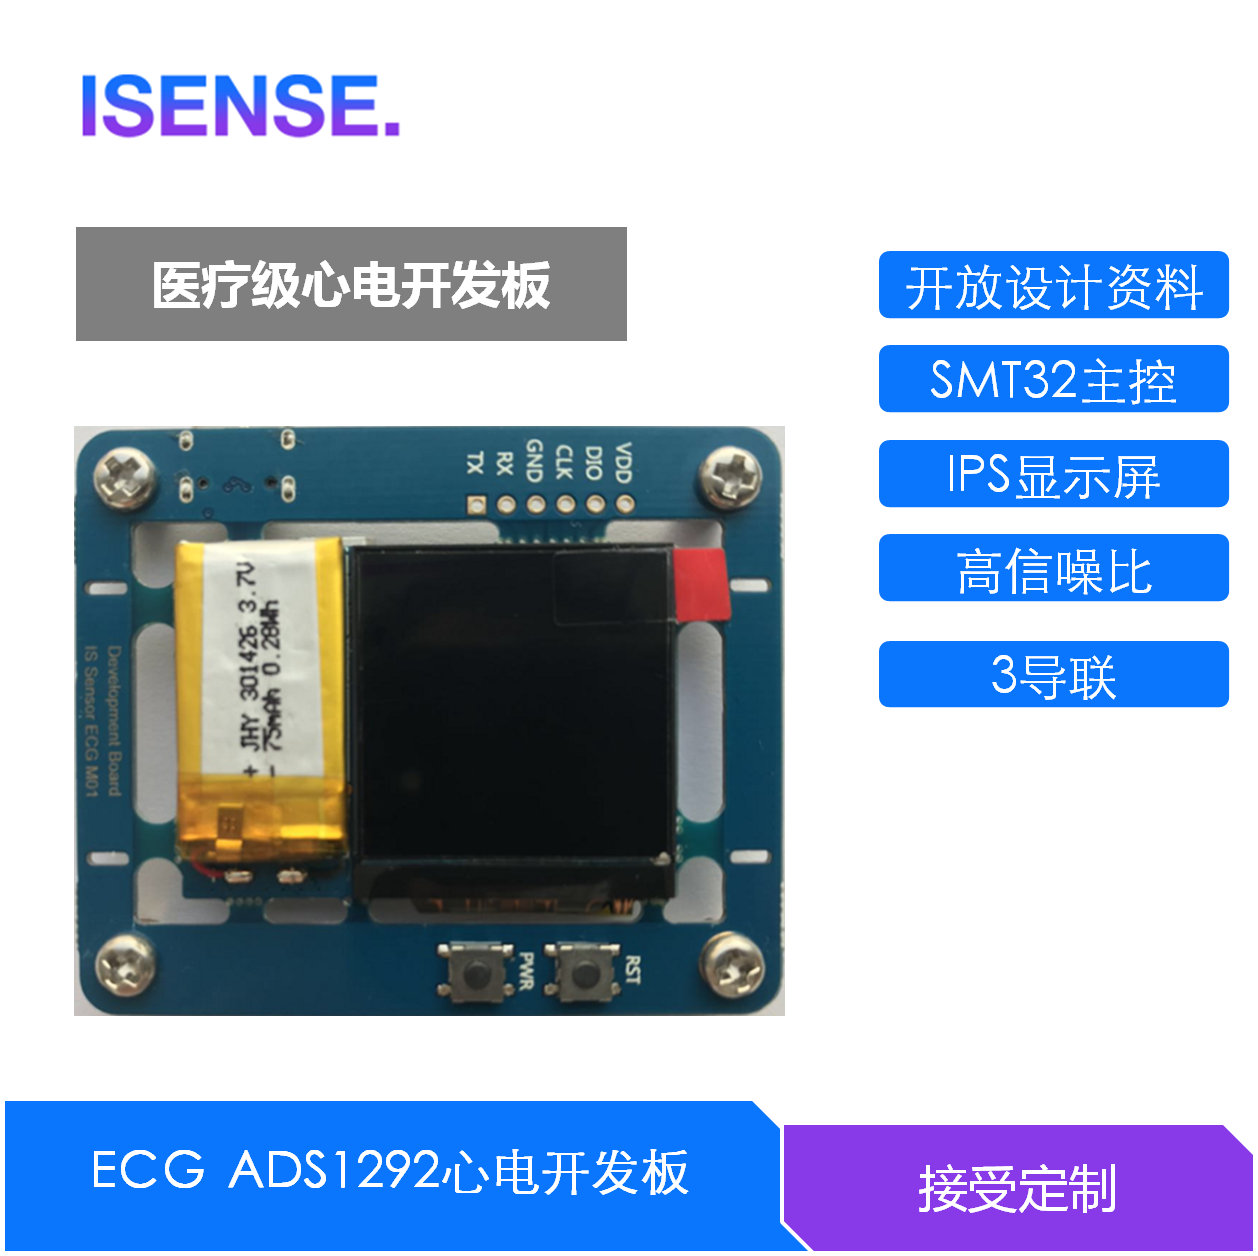 ADS1292 ECG Development Board Electrocardiogram (ECG) Physiological Signal Measurement 3-channel 24-bit IPS Display